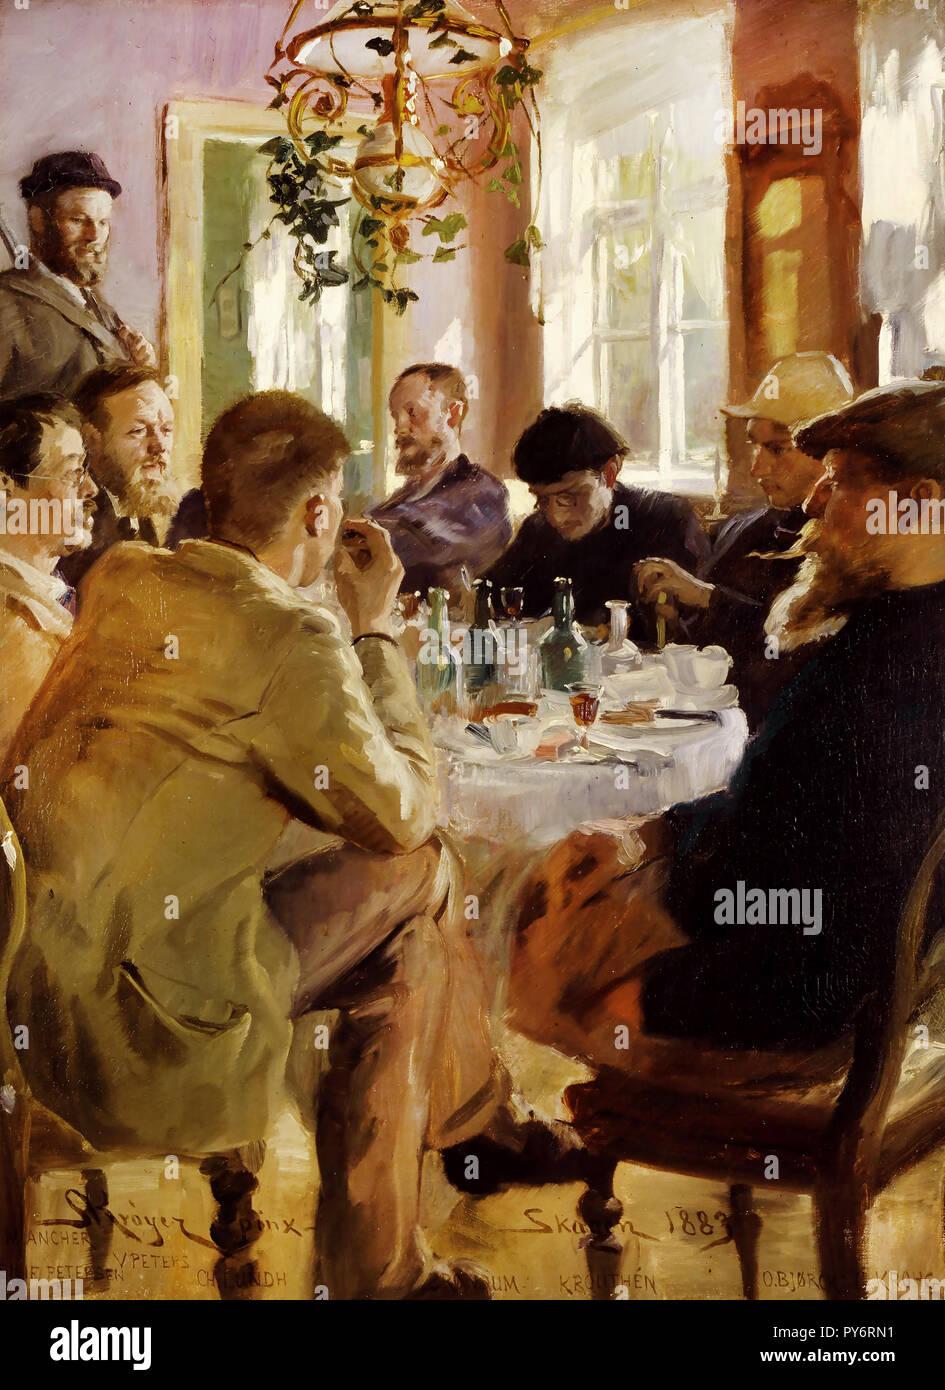 Peder Severin Kroyer, Artists' Luncheon at Brondum's Hotel 1883 Oil on canvas, Skagens Museum, Skagen, Denmark. - Stock Image